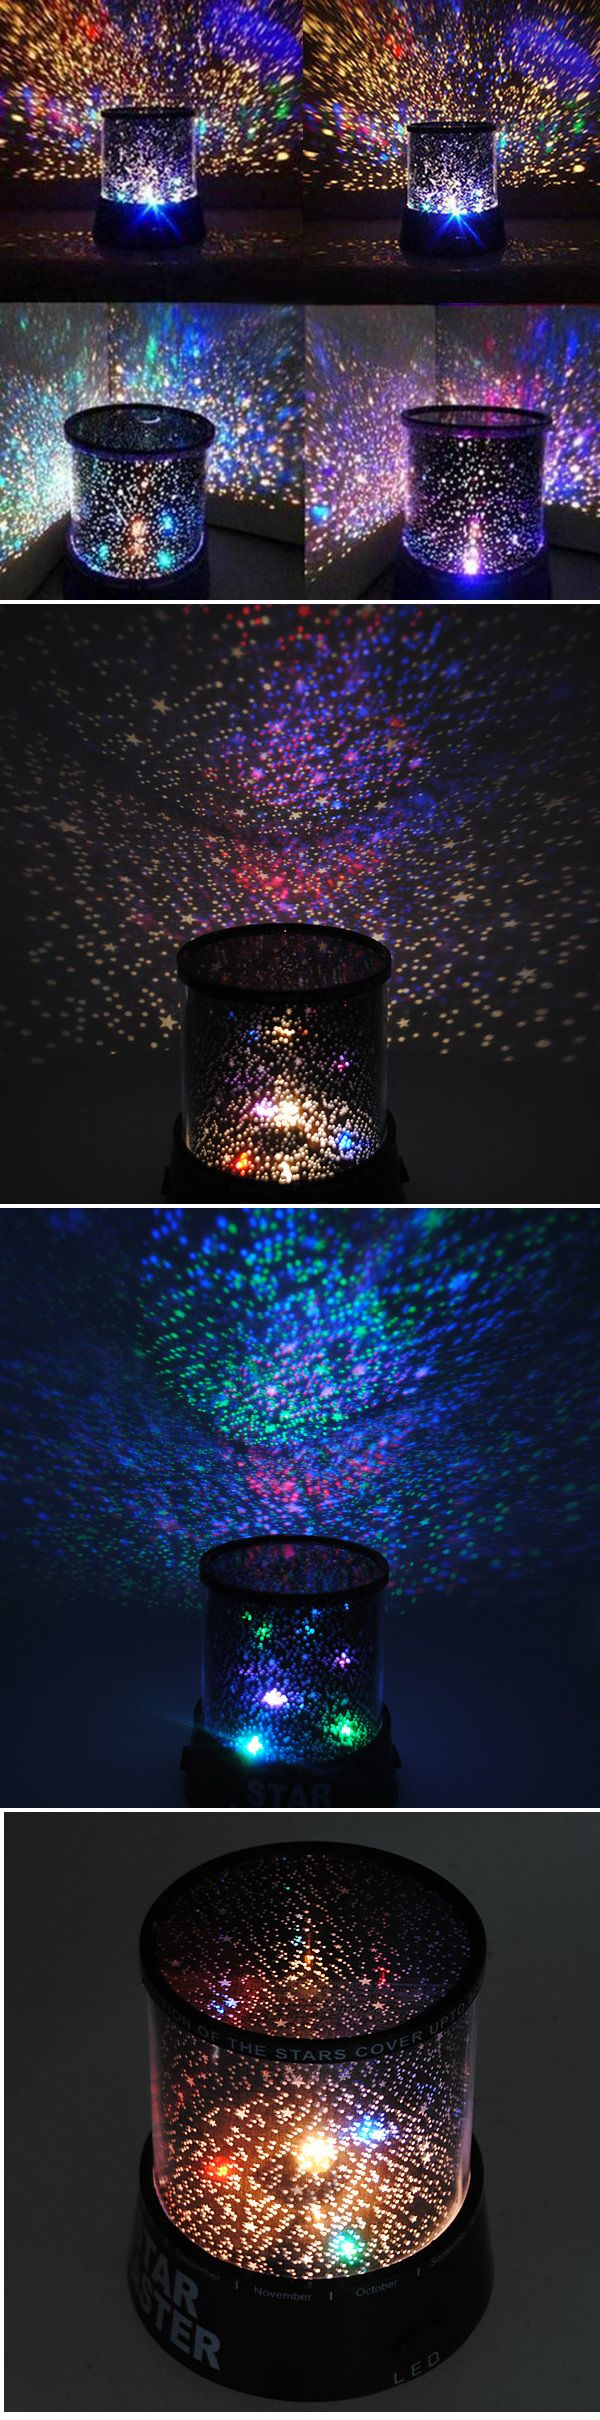 US$4.99 Amazing Laser Projector Lamp Sky Star Cosmos Night Light